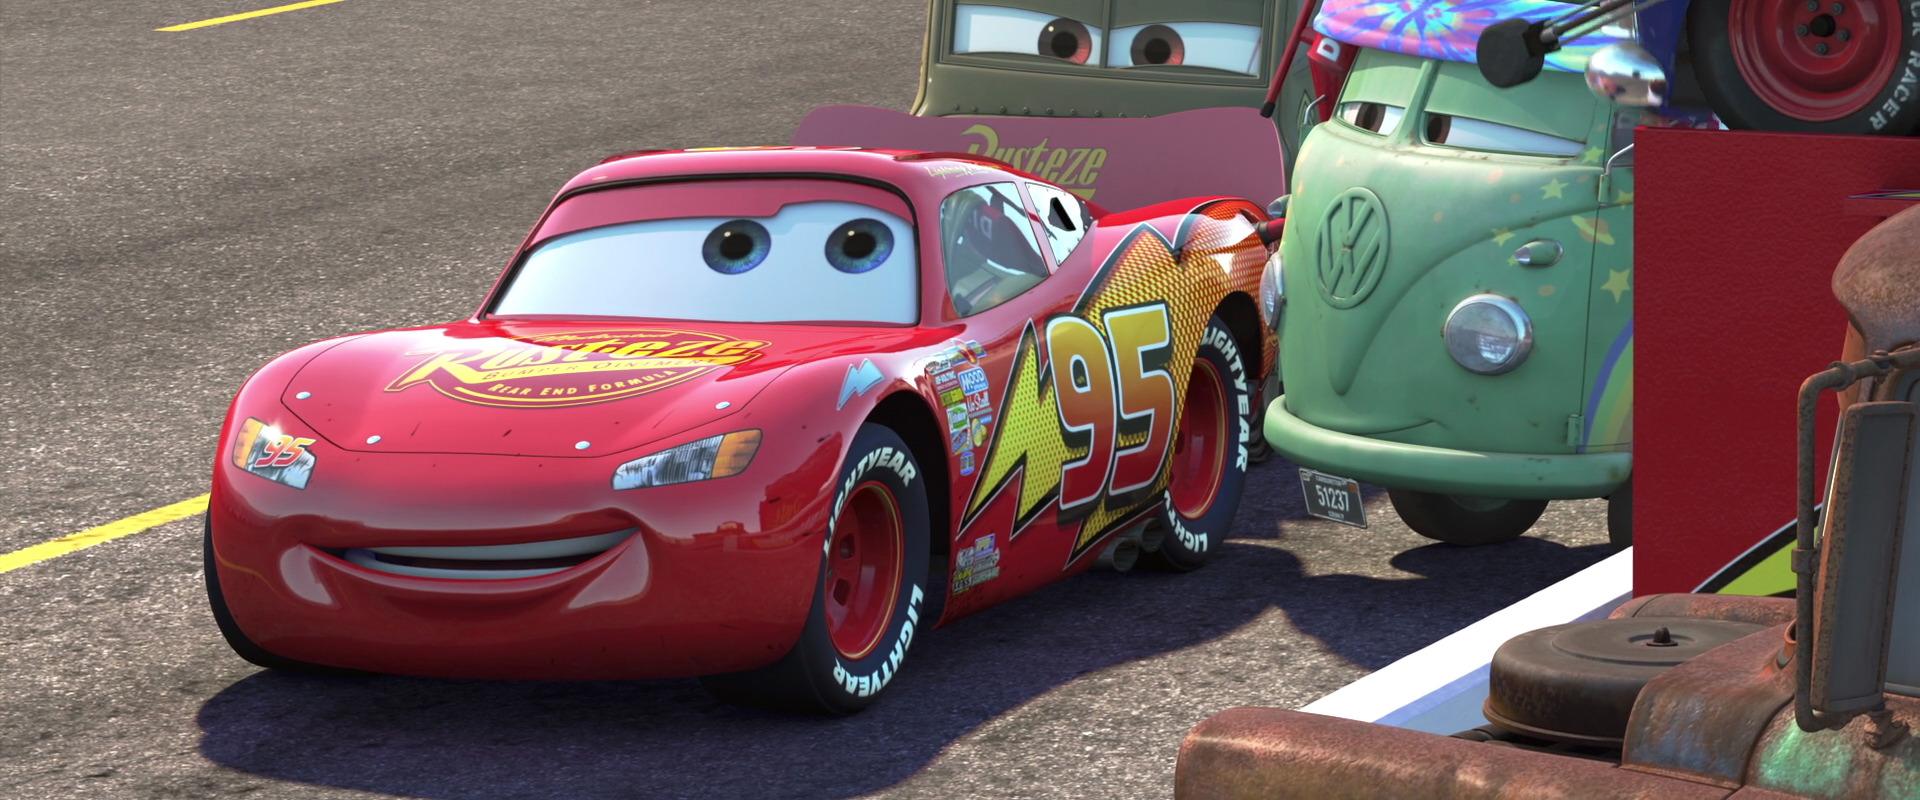 flash mcqueen personnage dans cars pixar planet fr. Black Bedroom Furniture Sets. Home Design Ideas